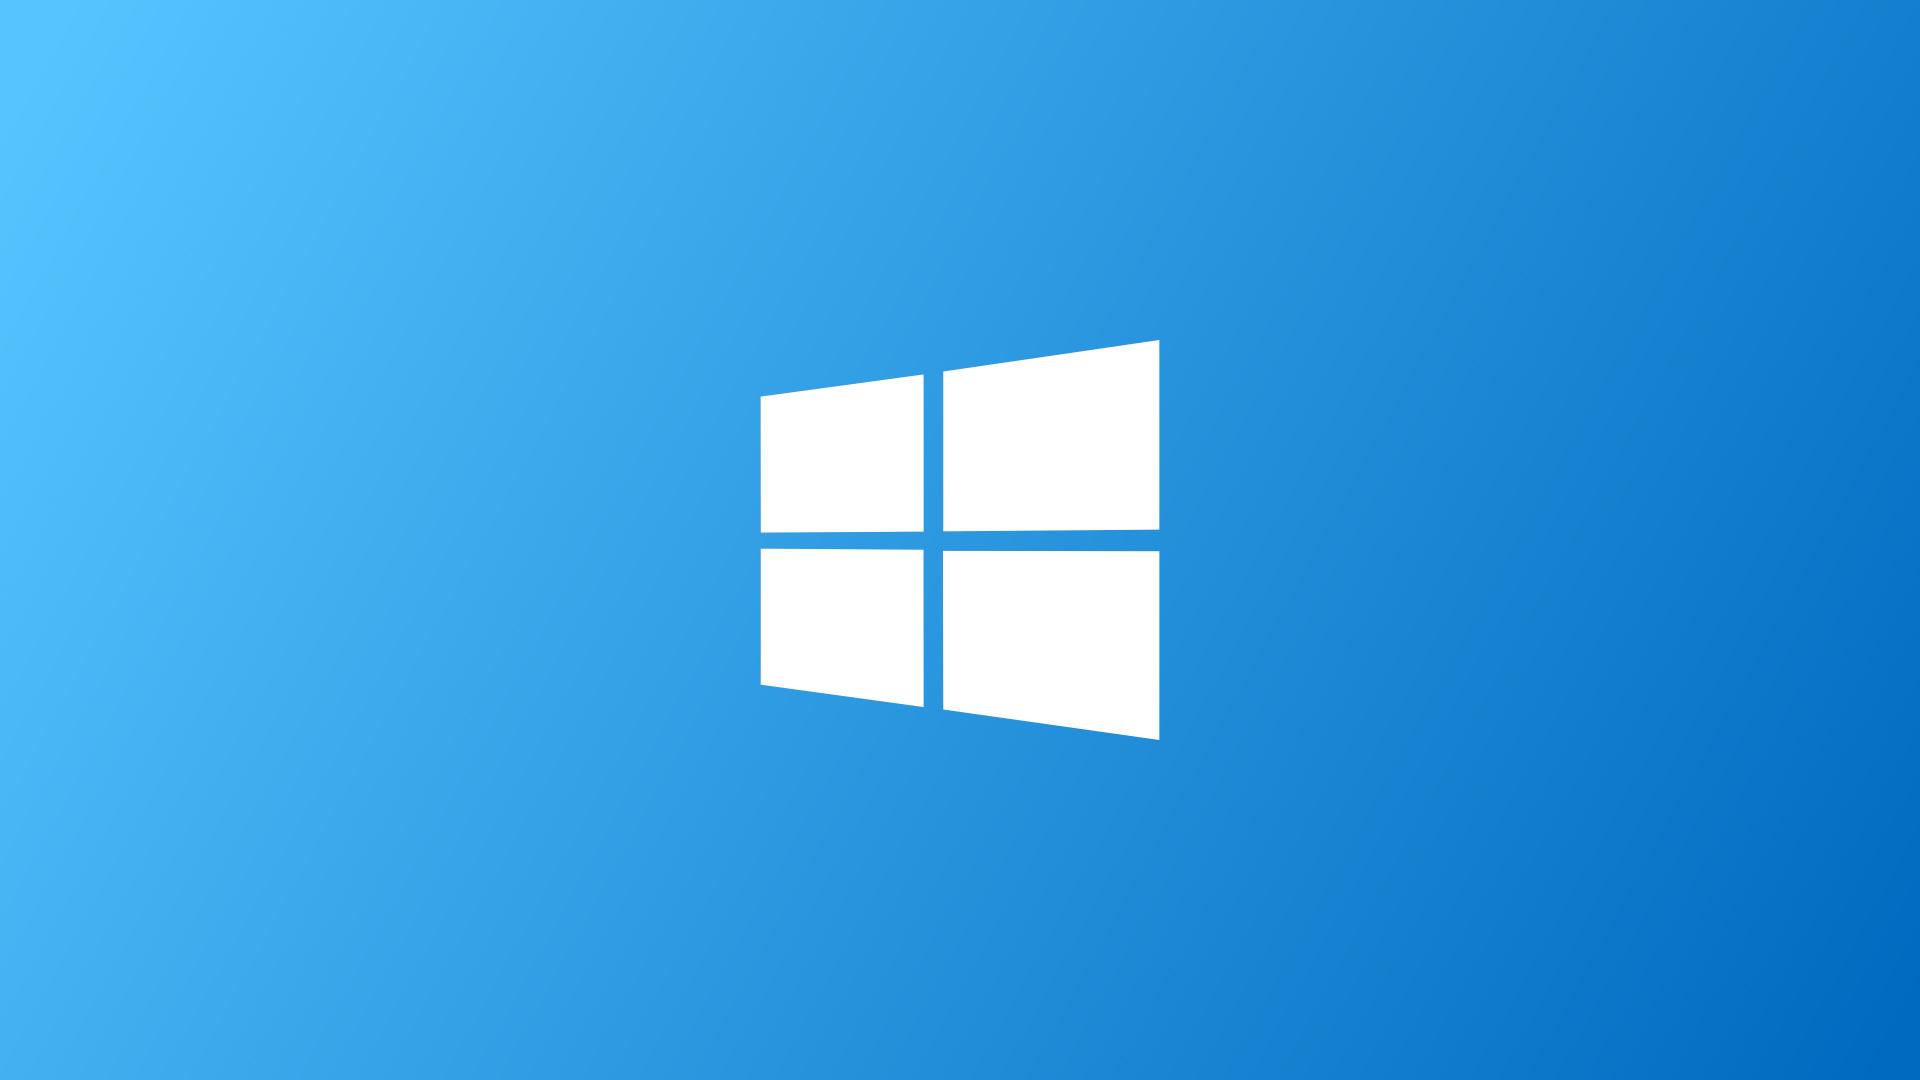 How to Fix Error Code 0xc0000022?